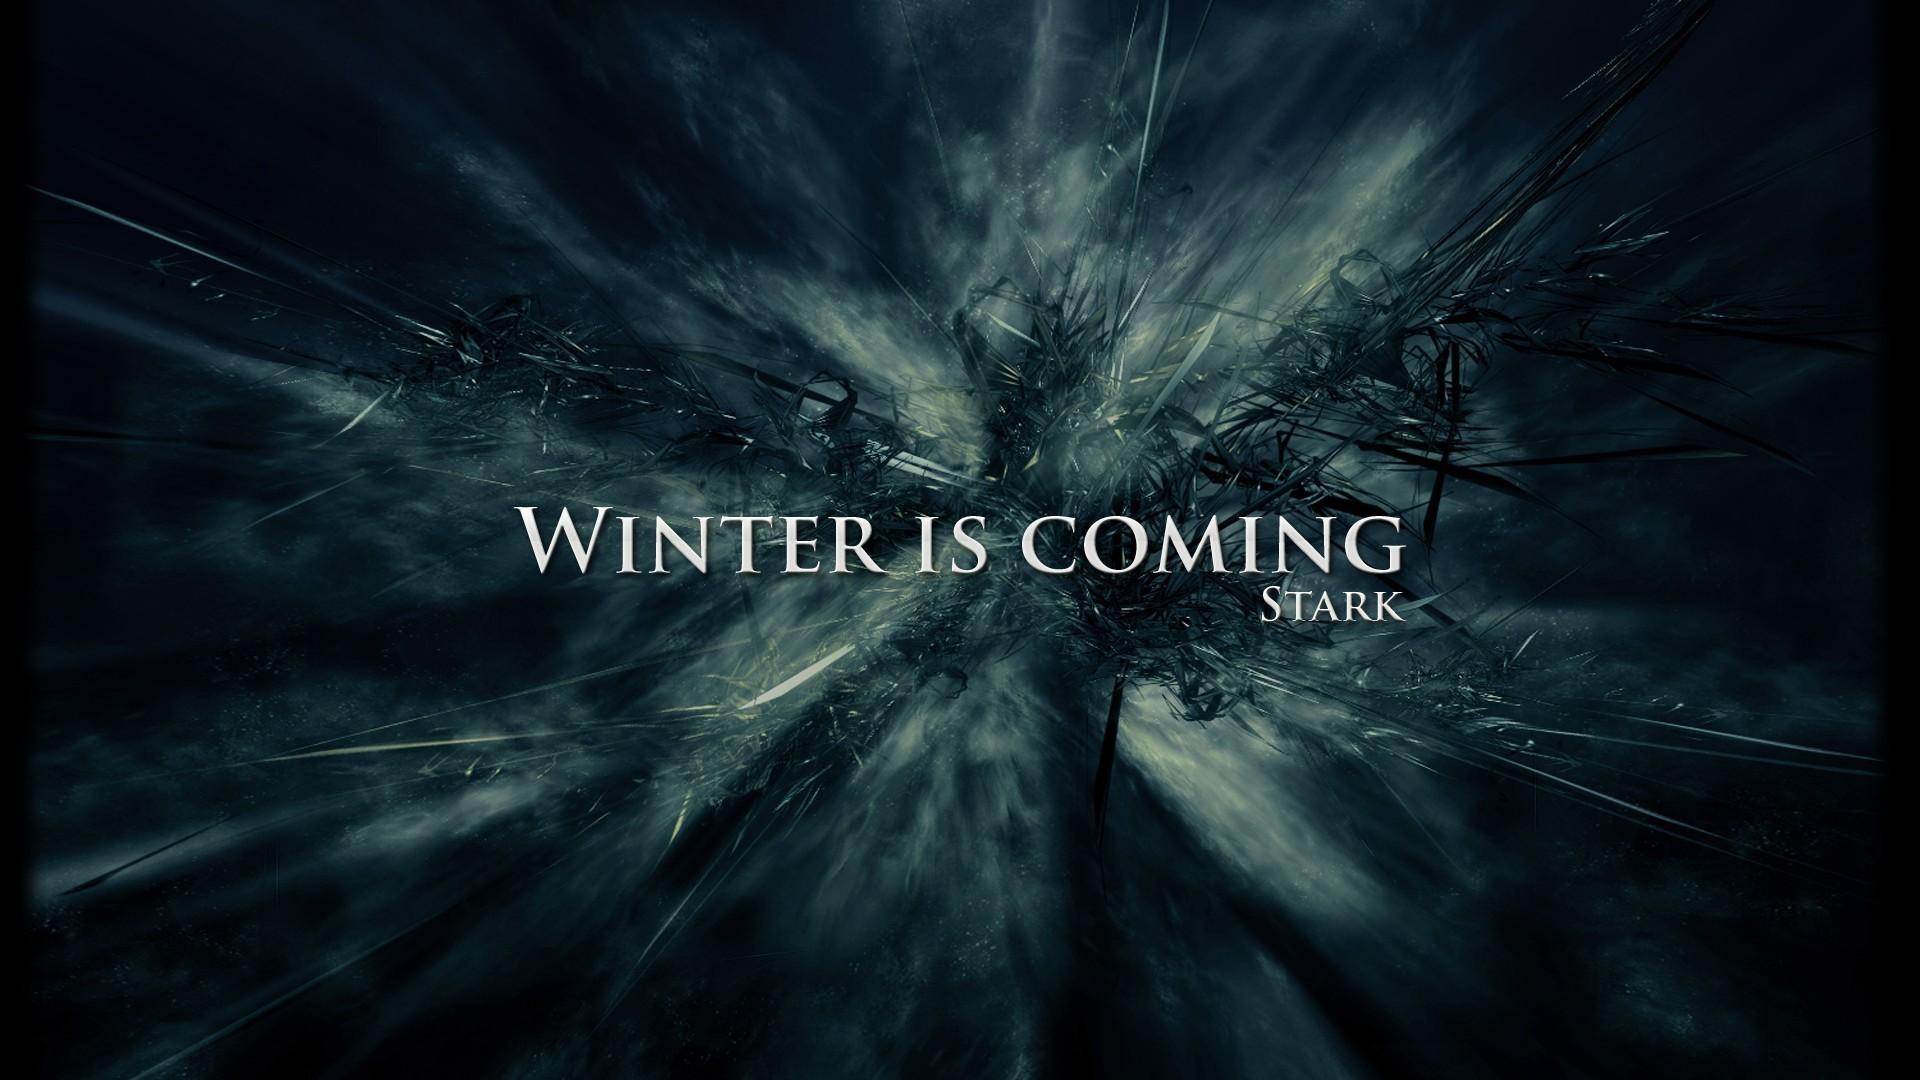 Game Of Thrones Tv Series Quotes Hd Wallpaper PoPoPicscom 1920x1080